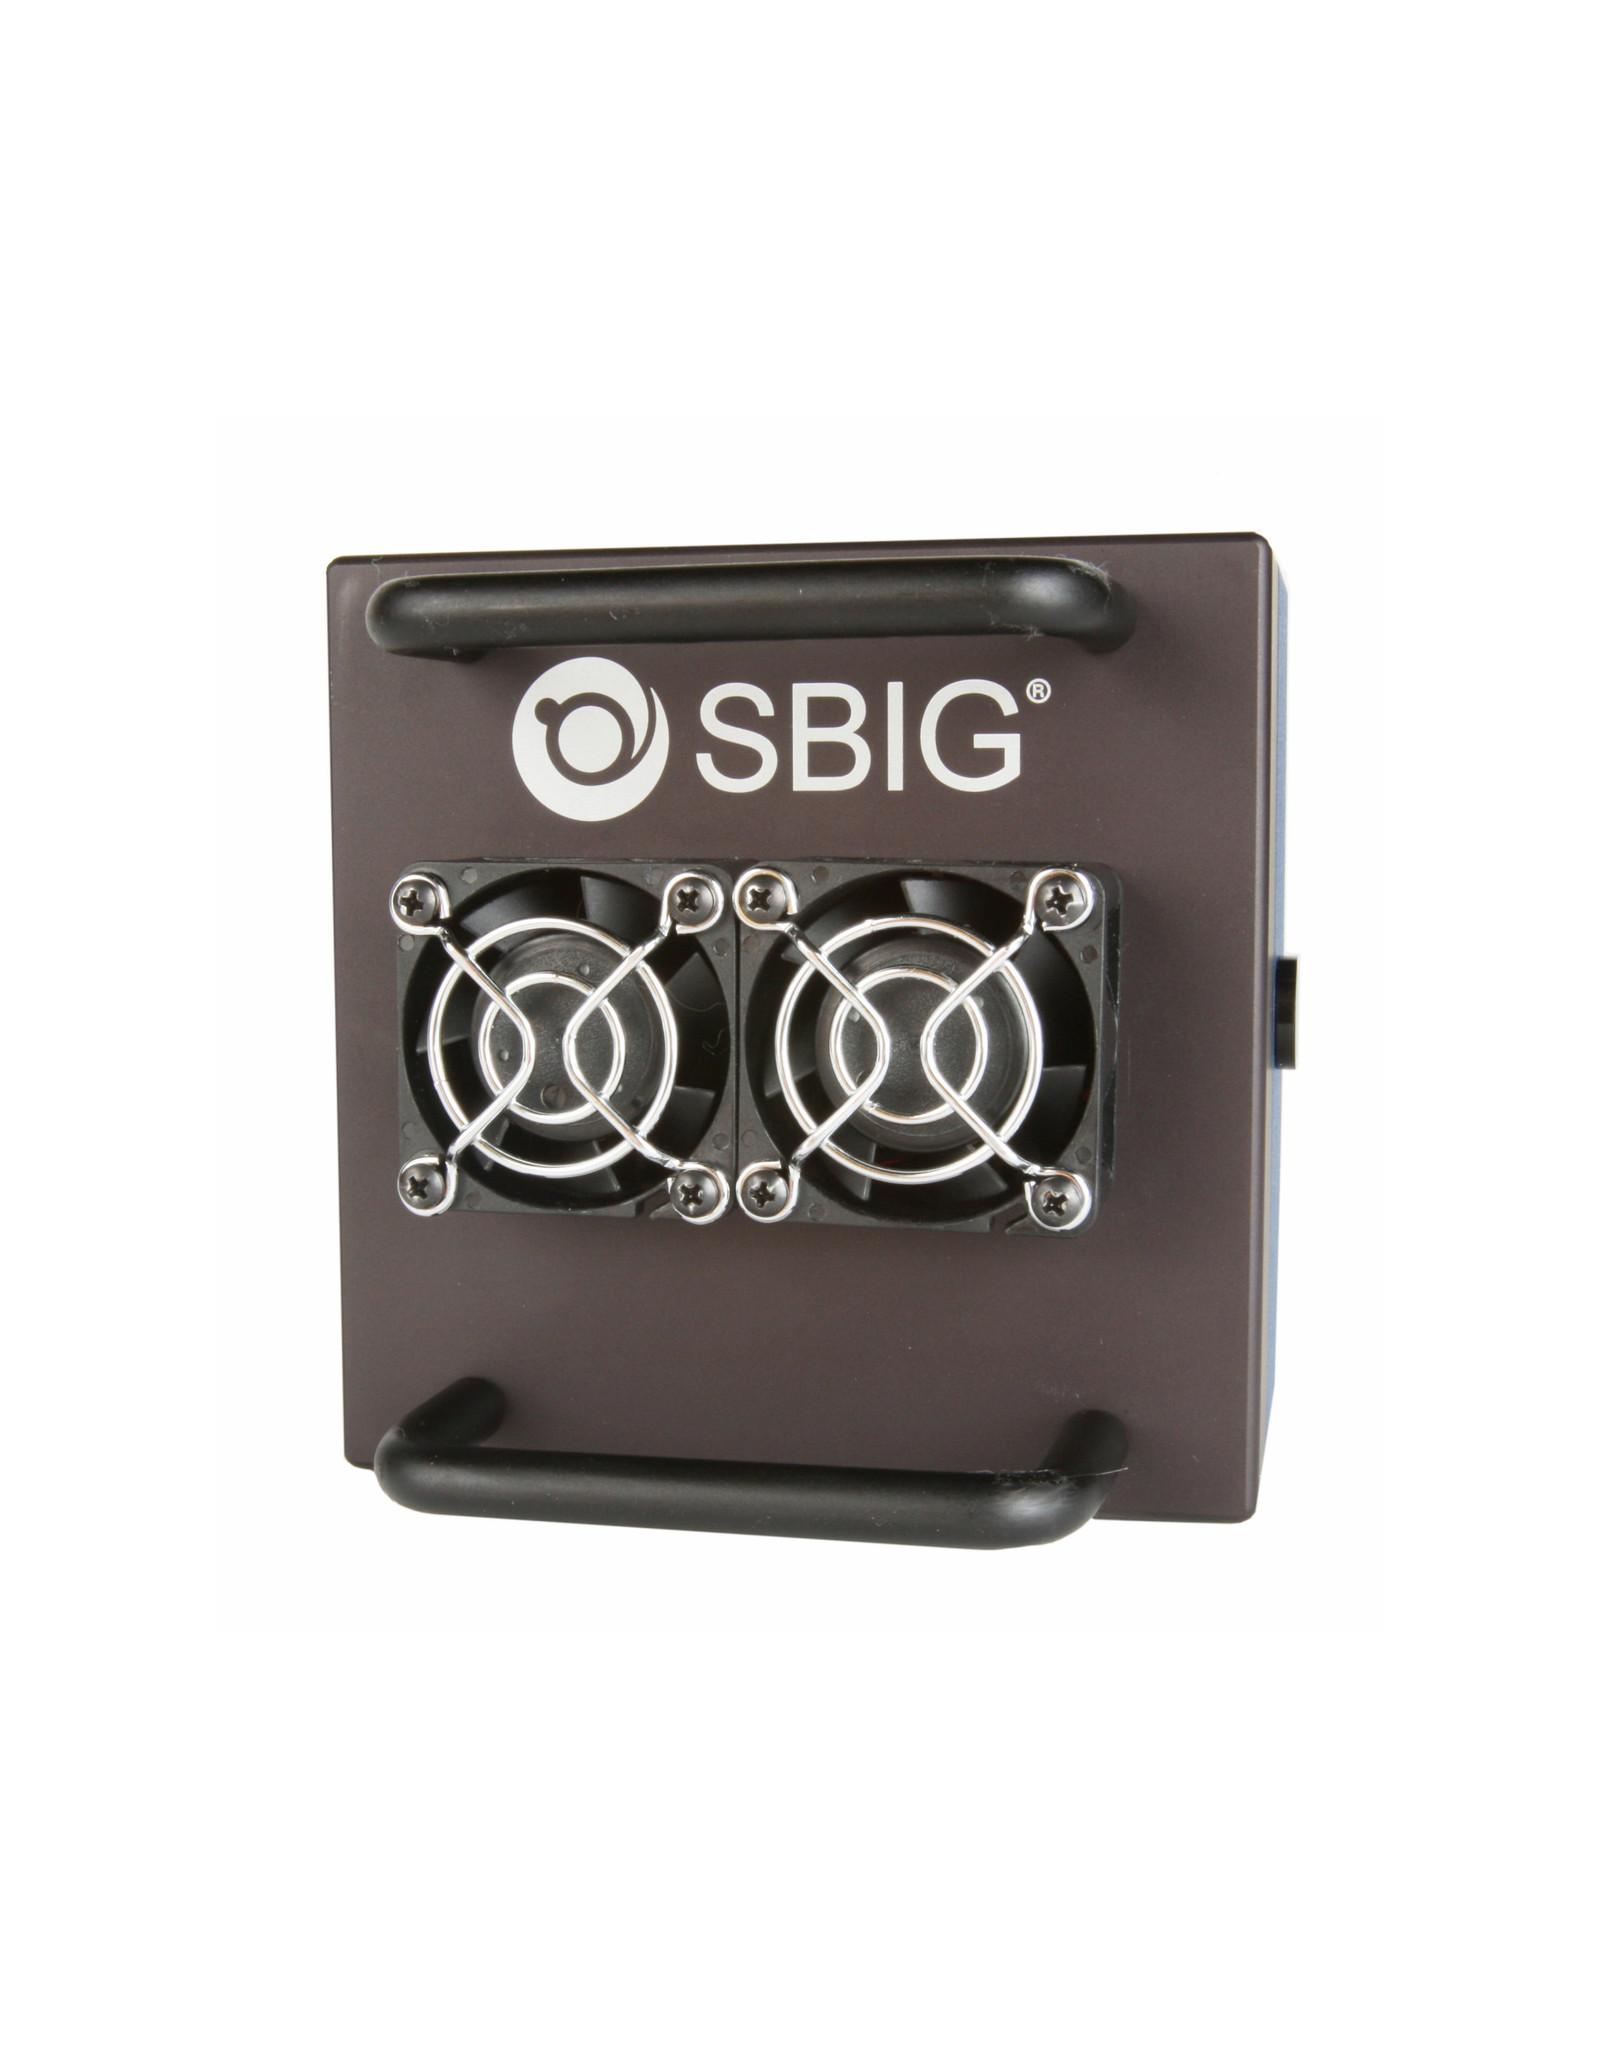 SBIG SBig Aluma 47-10 back-illuminated Camera(Midband)